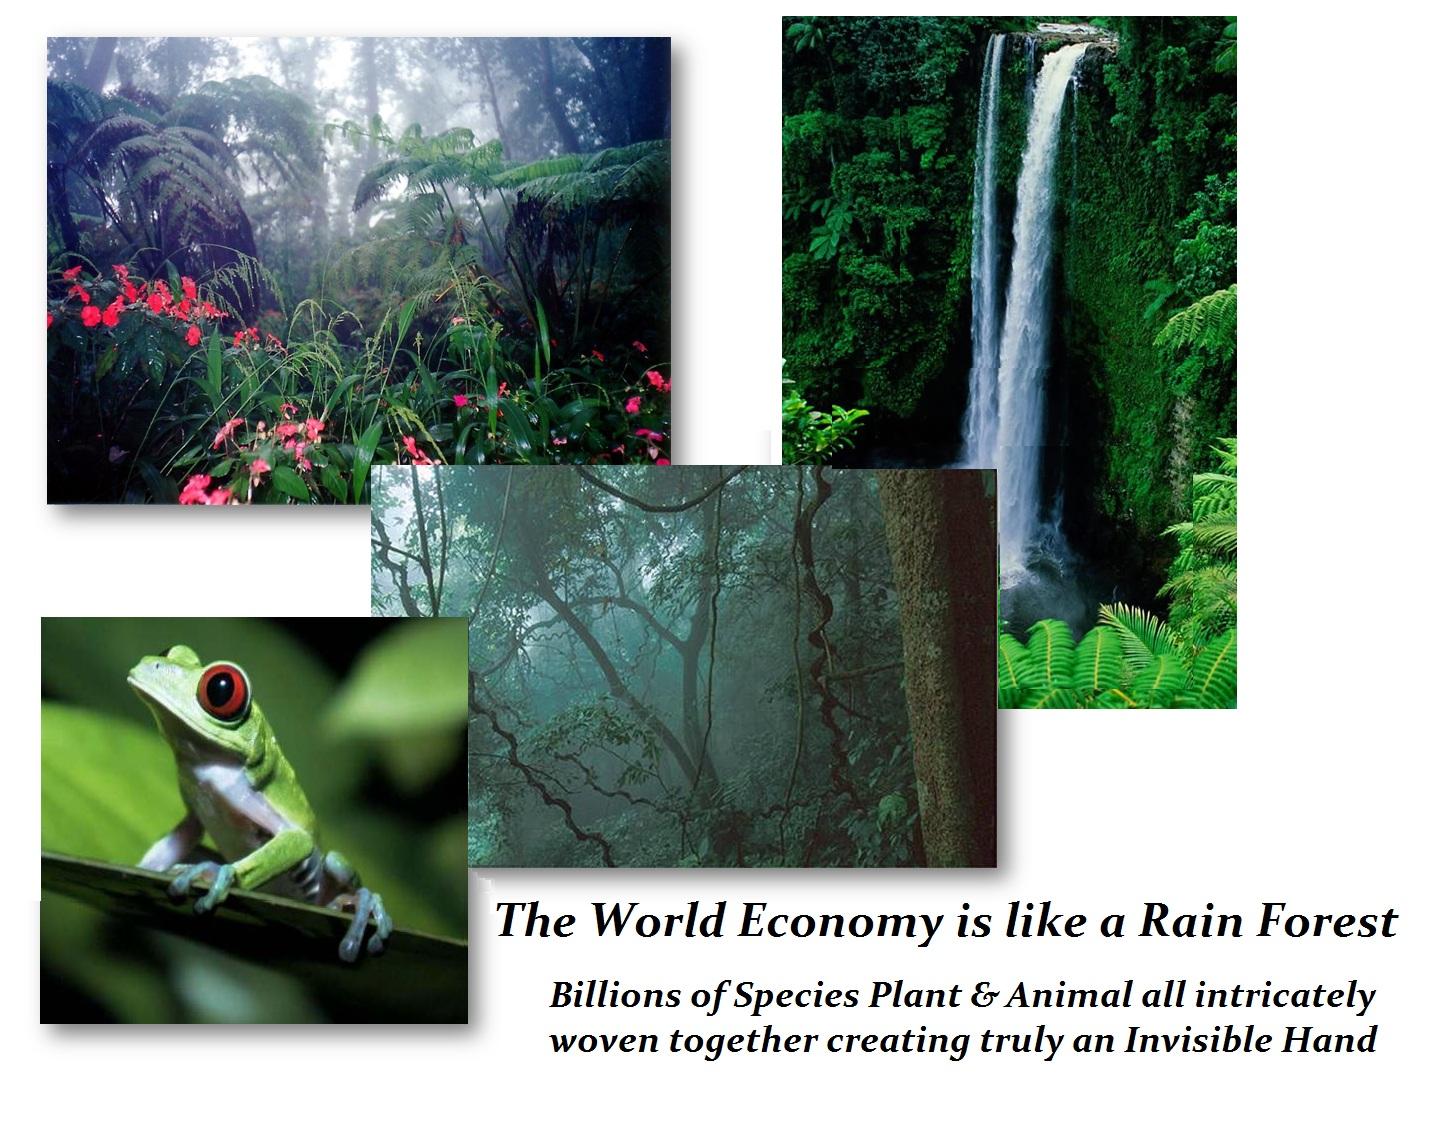 Rain Forest Economy